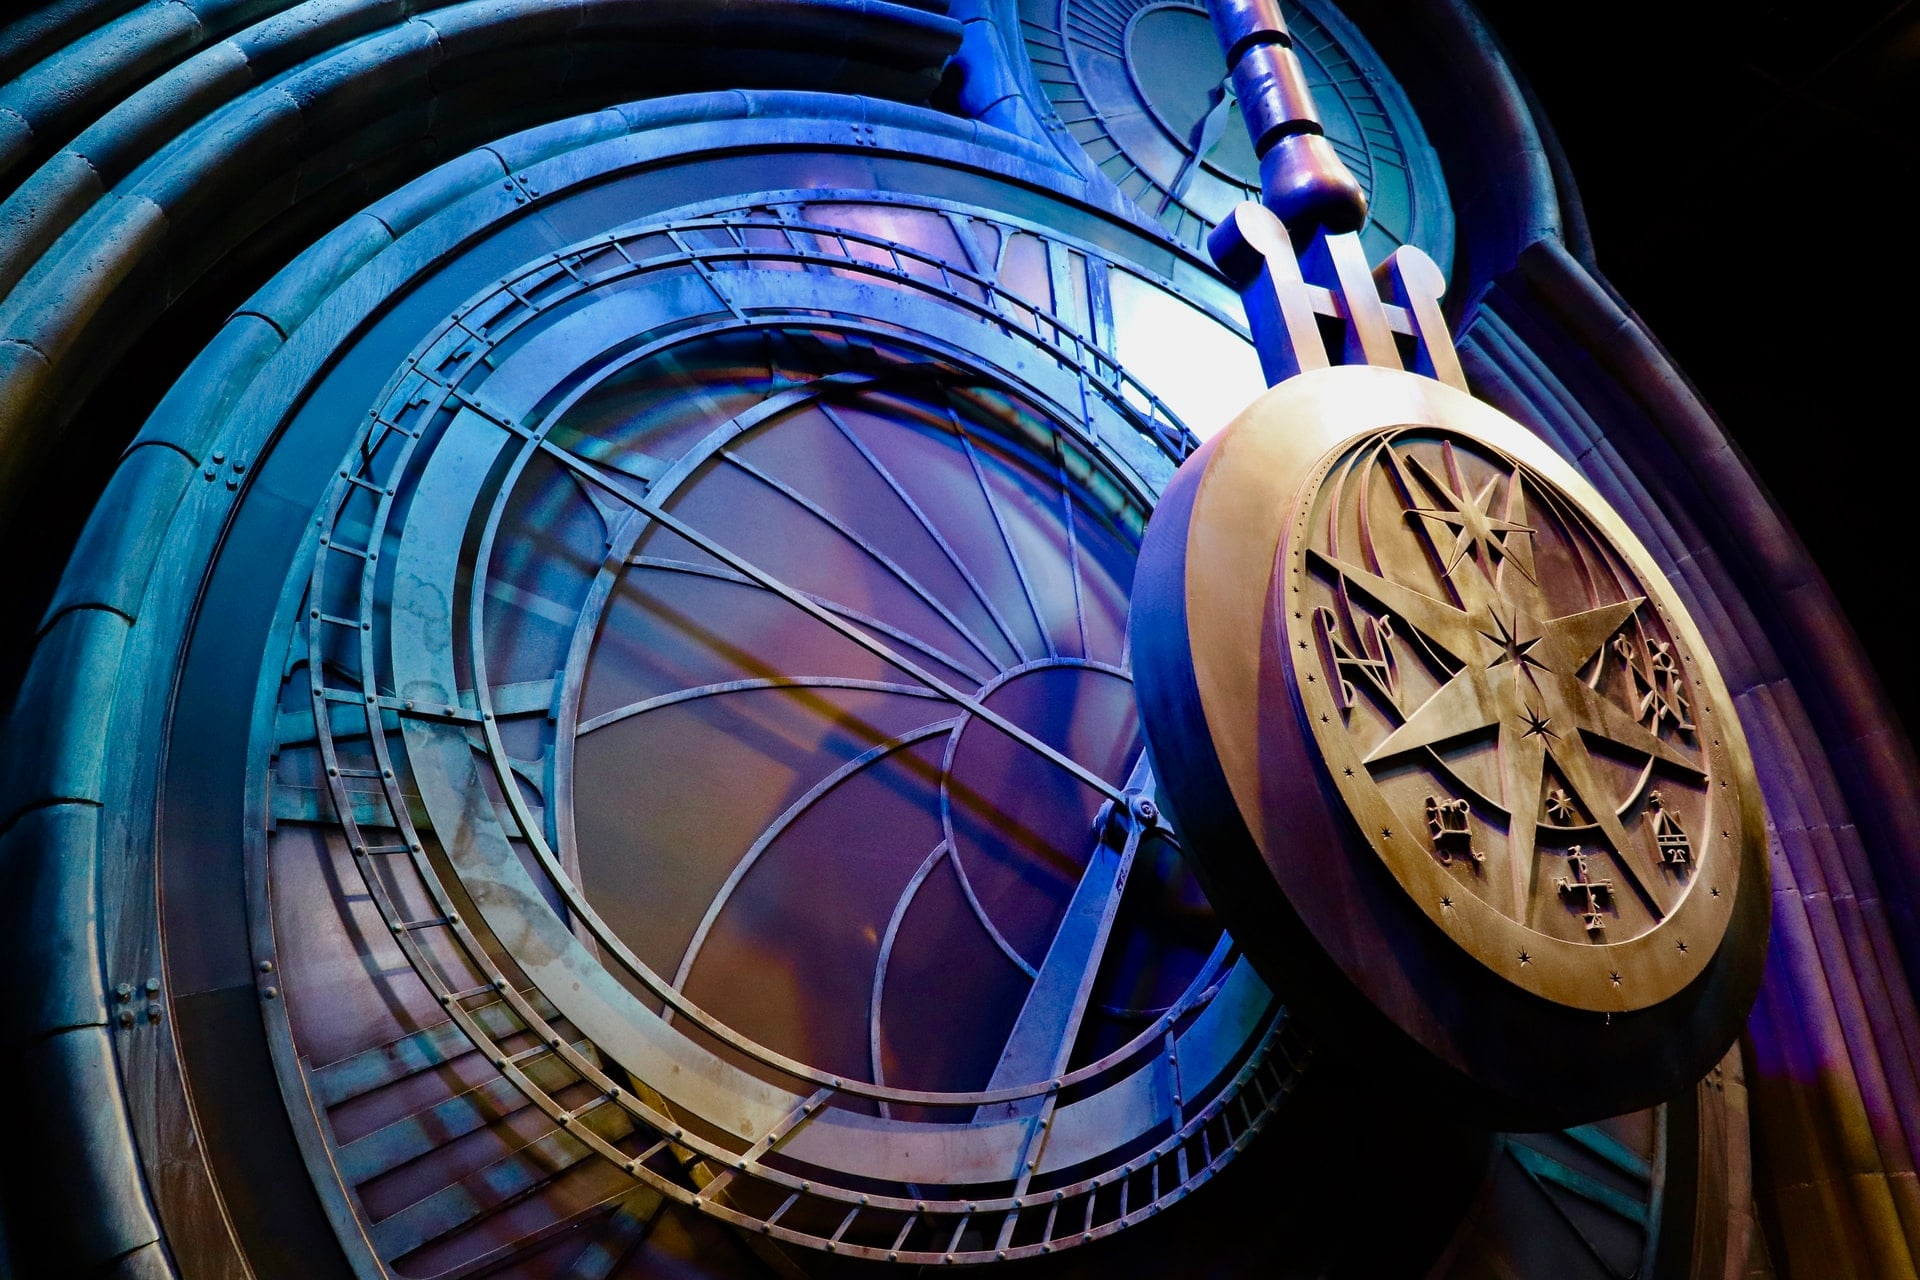 pendulum-clock-swinging-lit-up-in-blue-and-purple-lights-at-harry-potter-warner-bros-studio-tour-watford